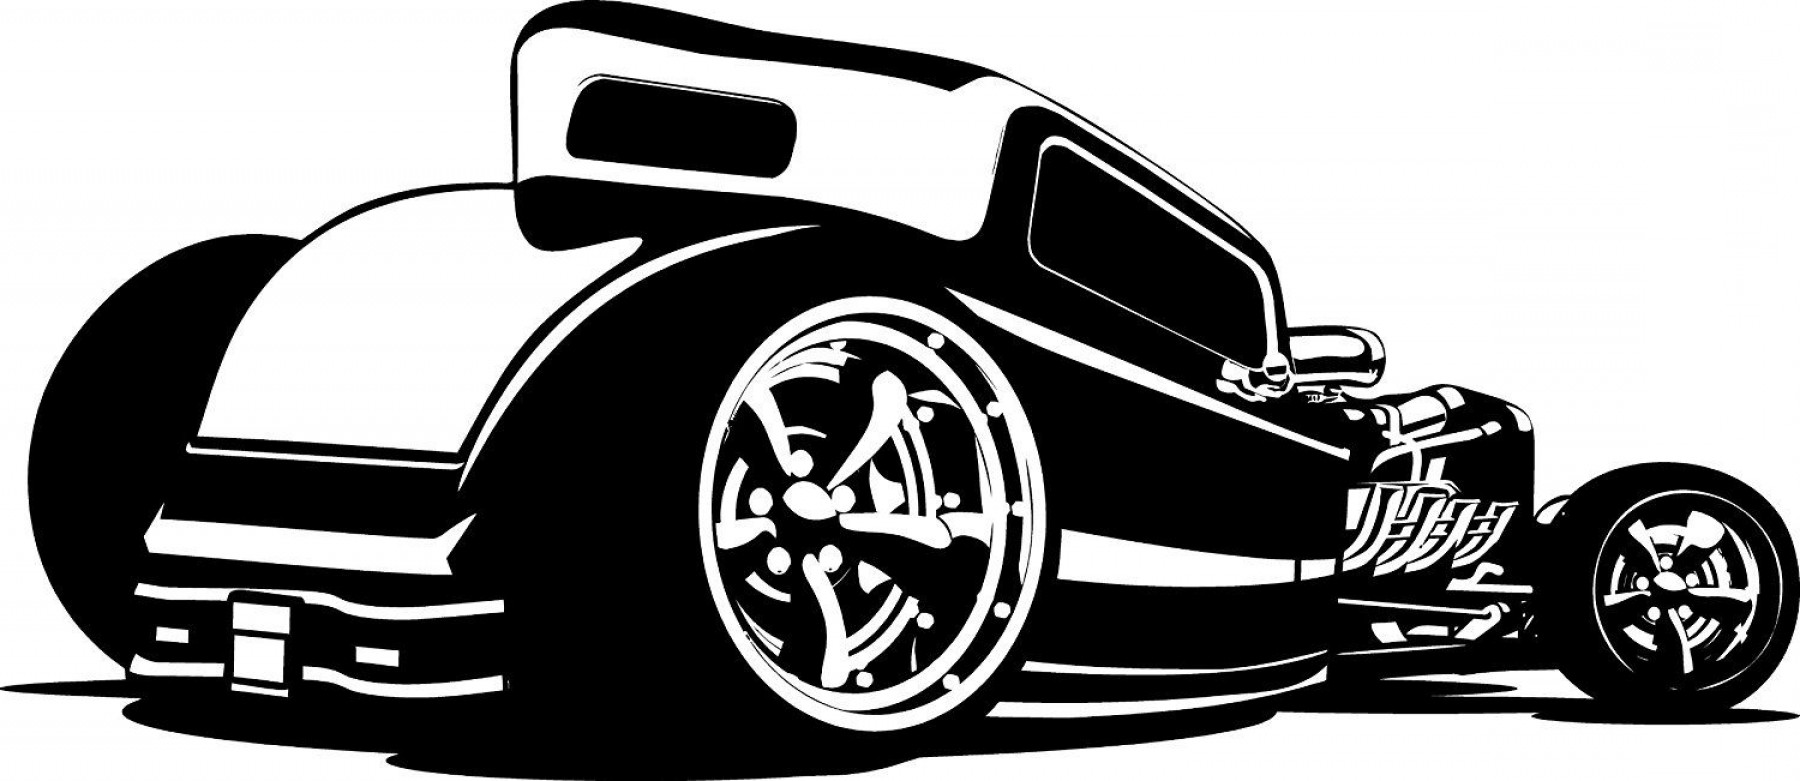 Clipart hot rod image freeuse stock Hot Rod Clipart Black And White | SOIDERGI image freeuse stock